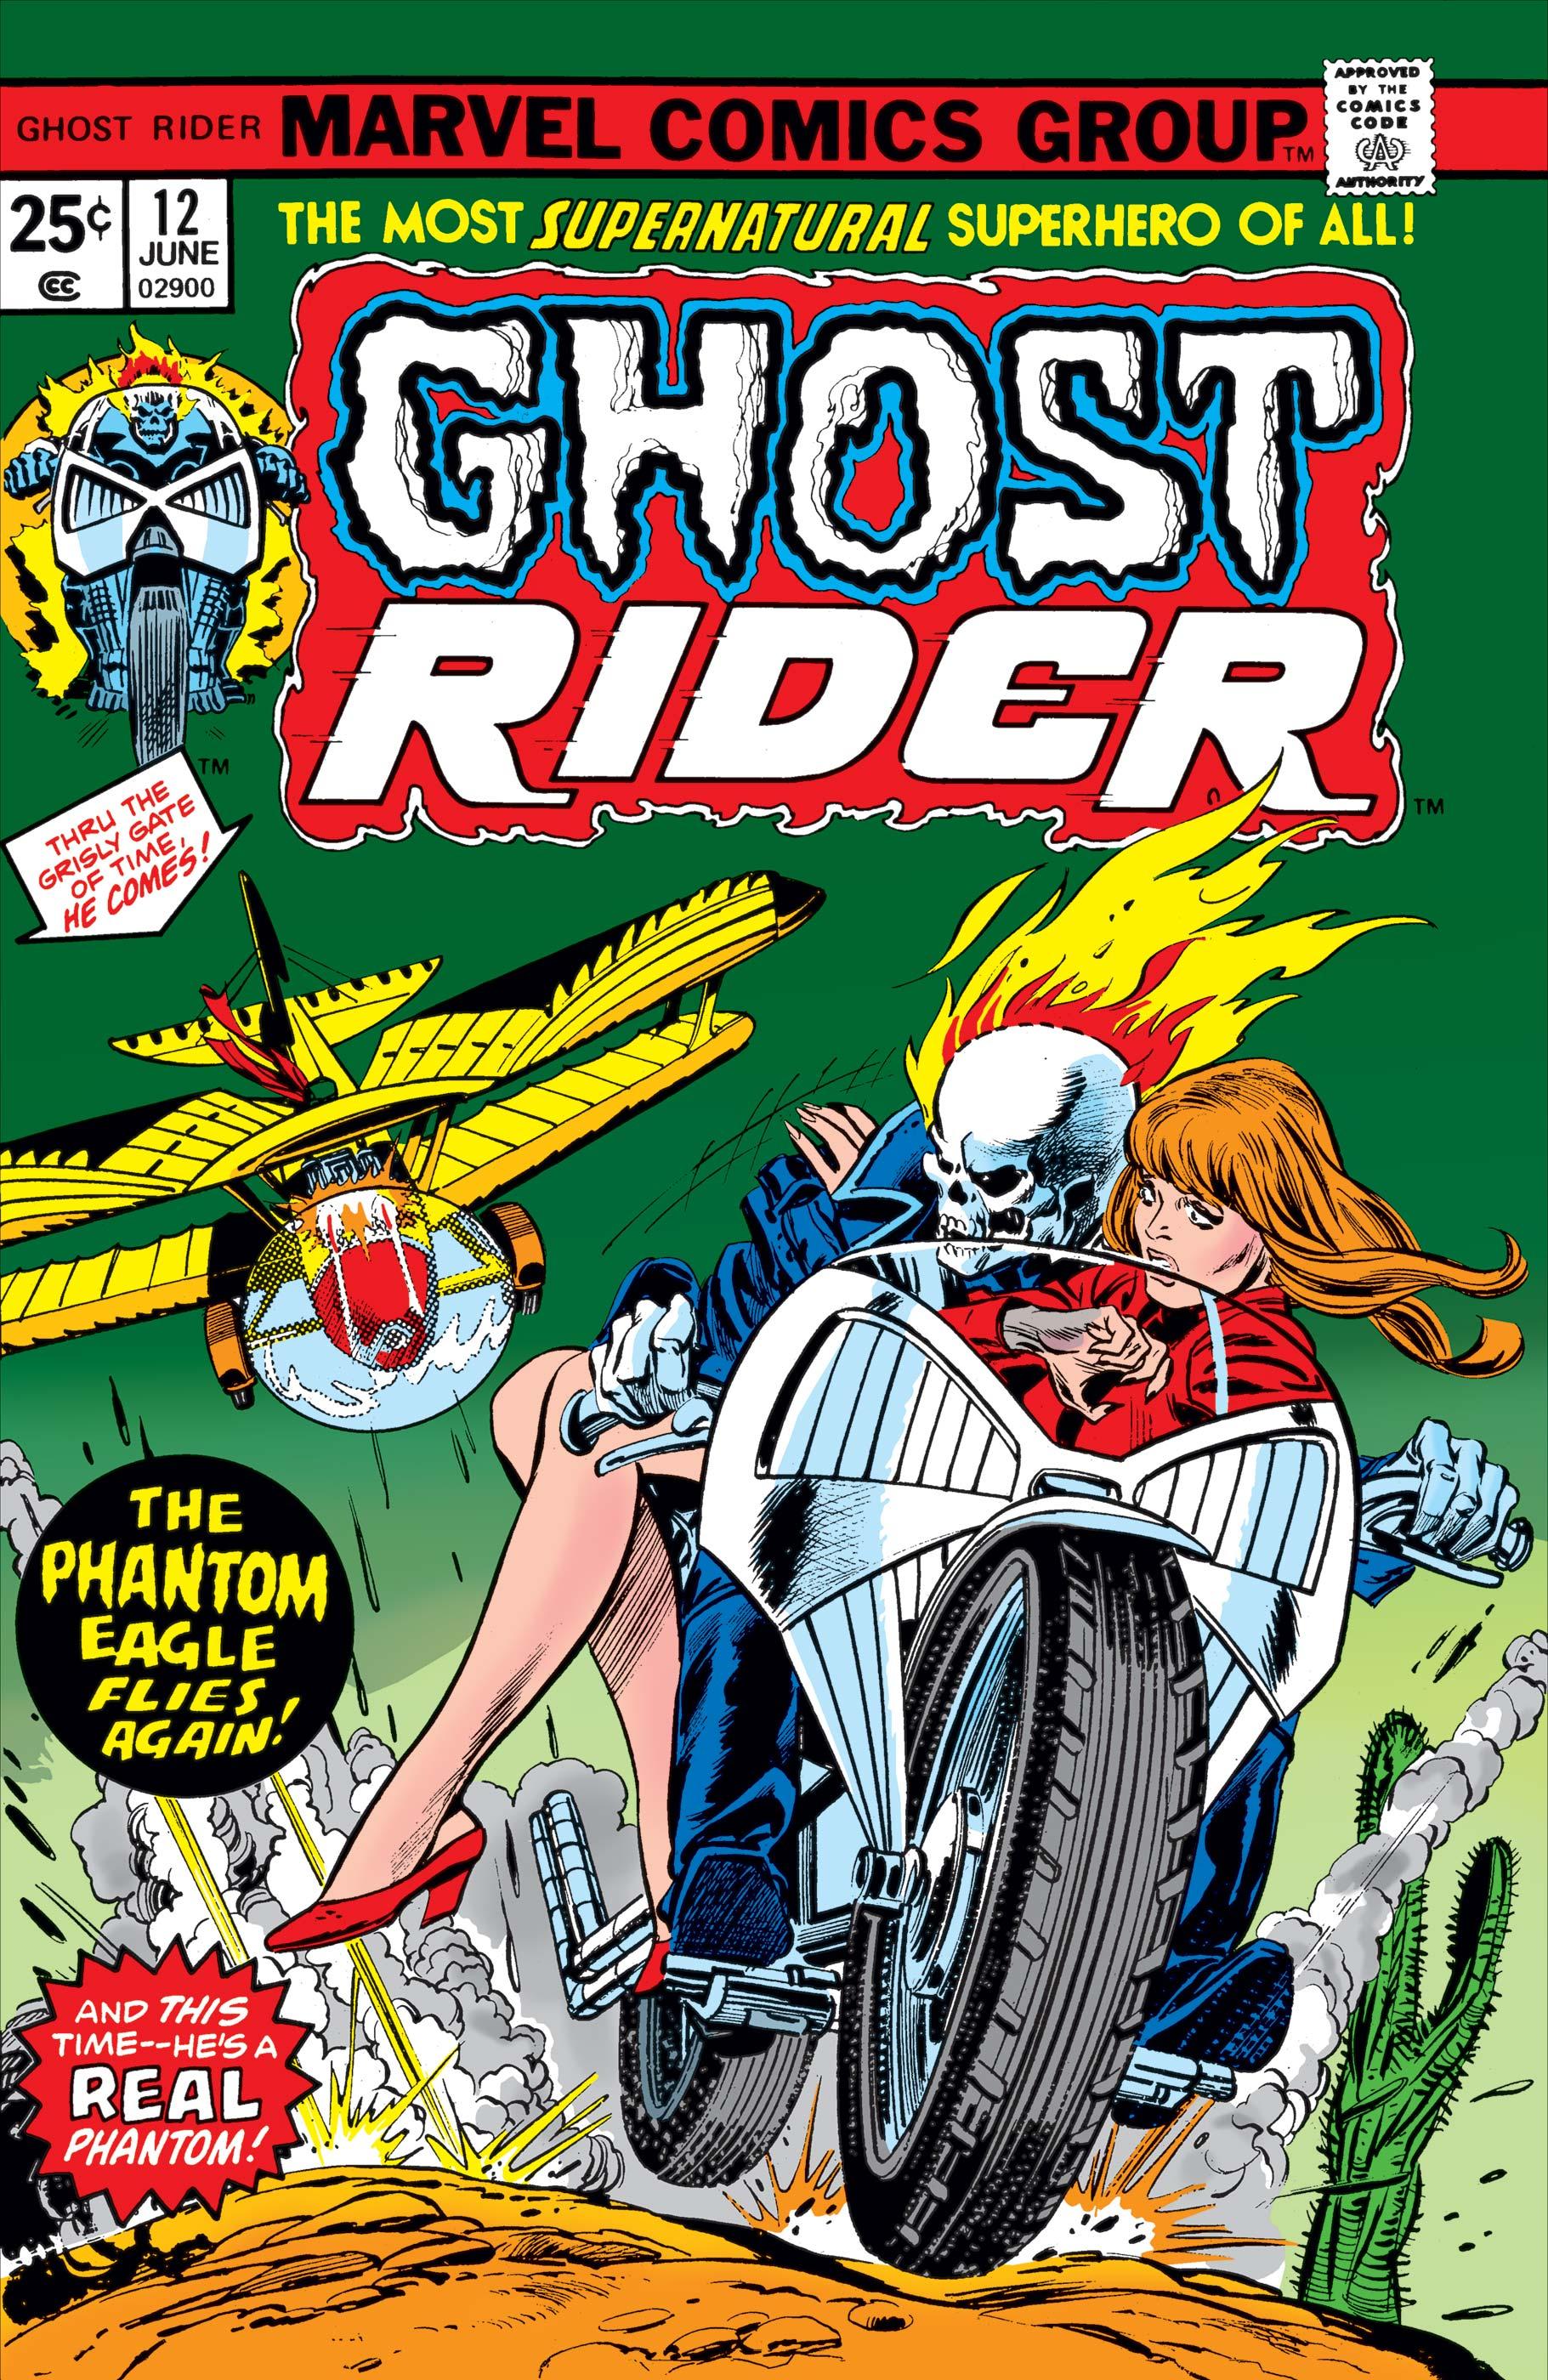 Ghost Rider (1973) #12